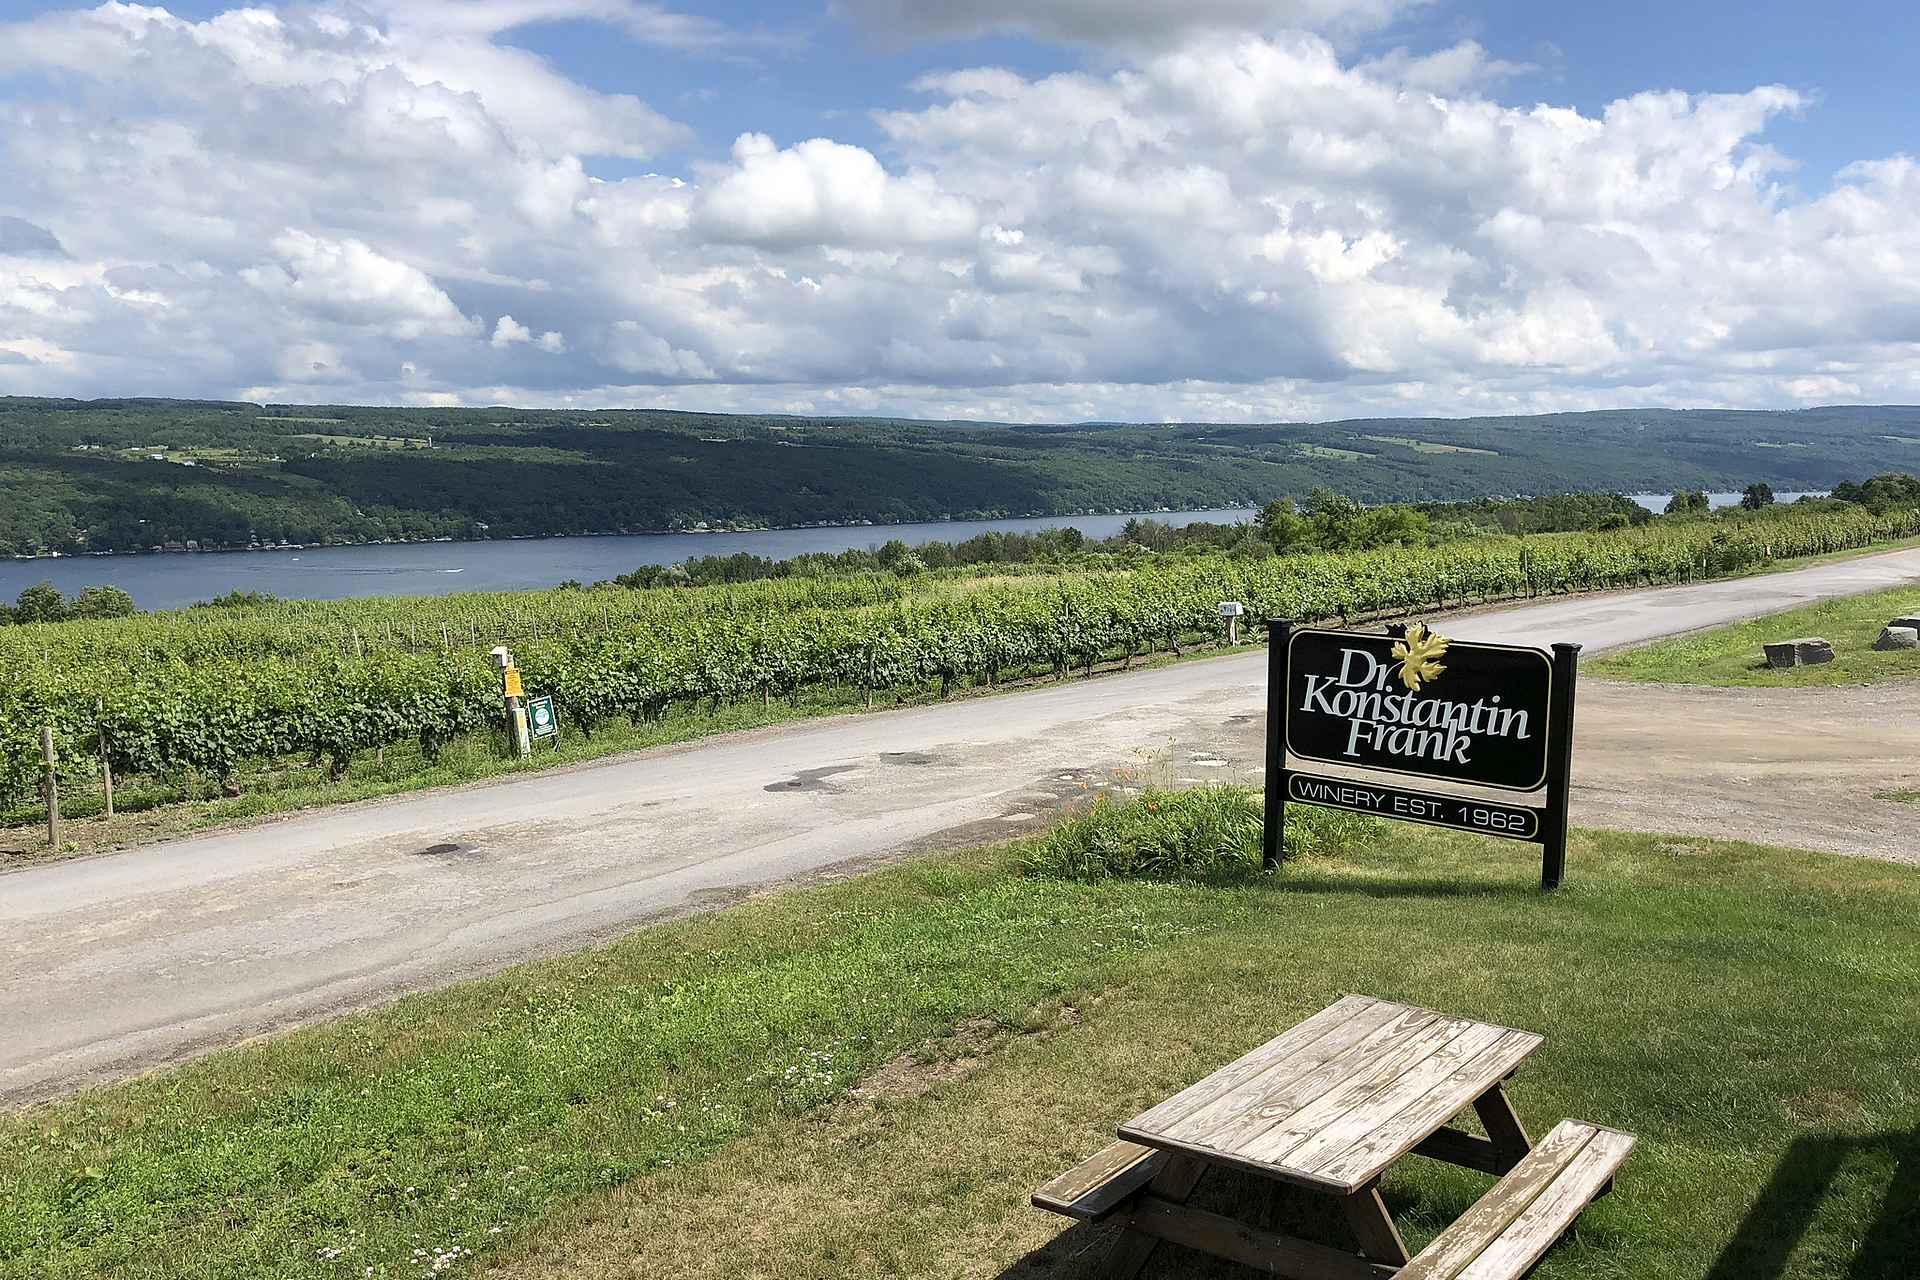 Finger Lakes viinibuumin isä Dr. Konstantin Frank